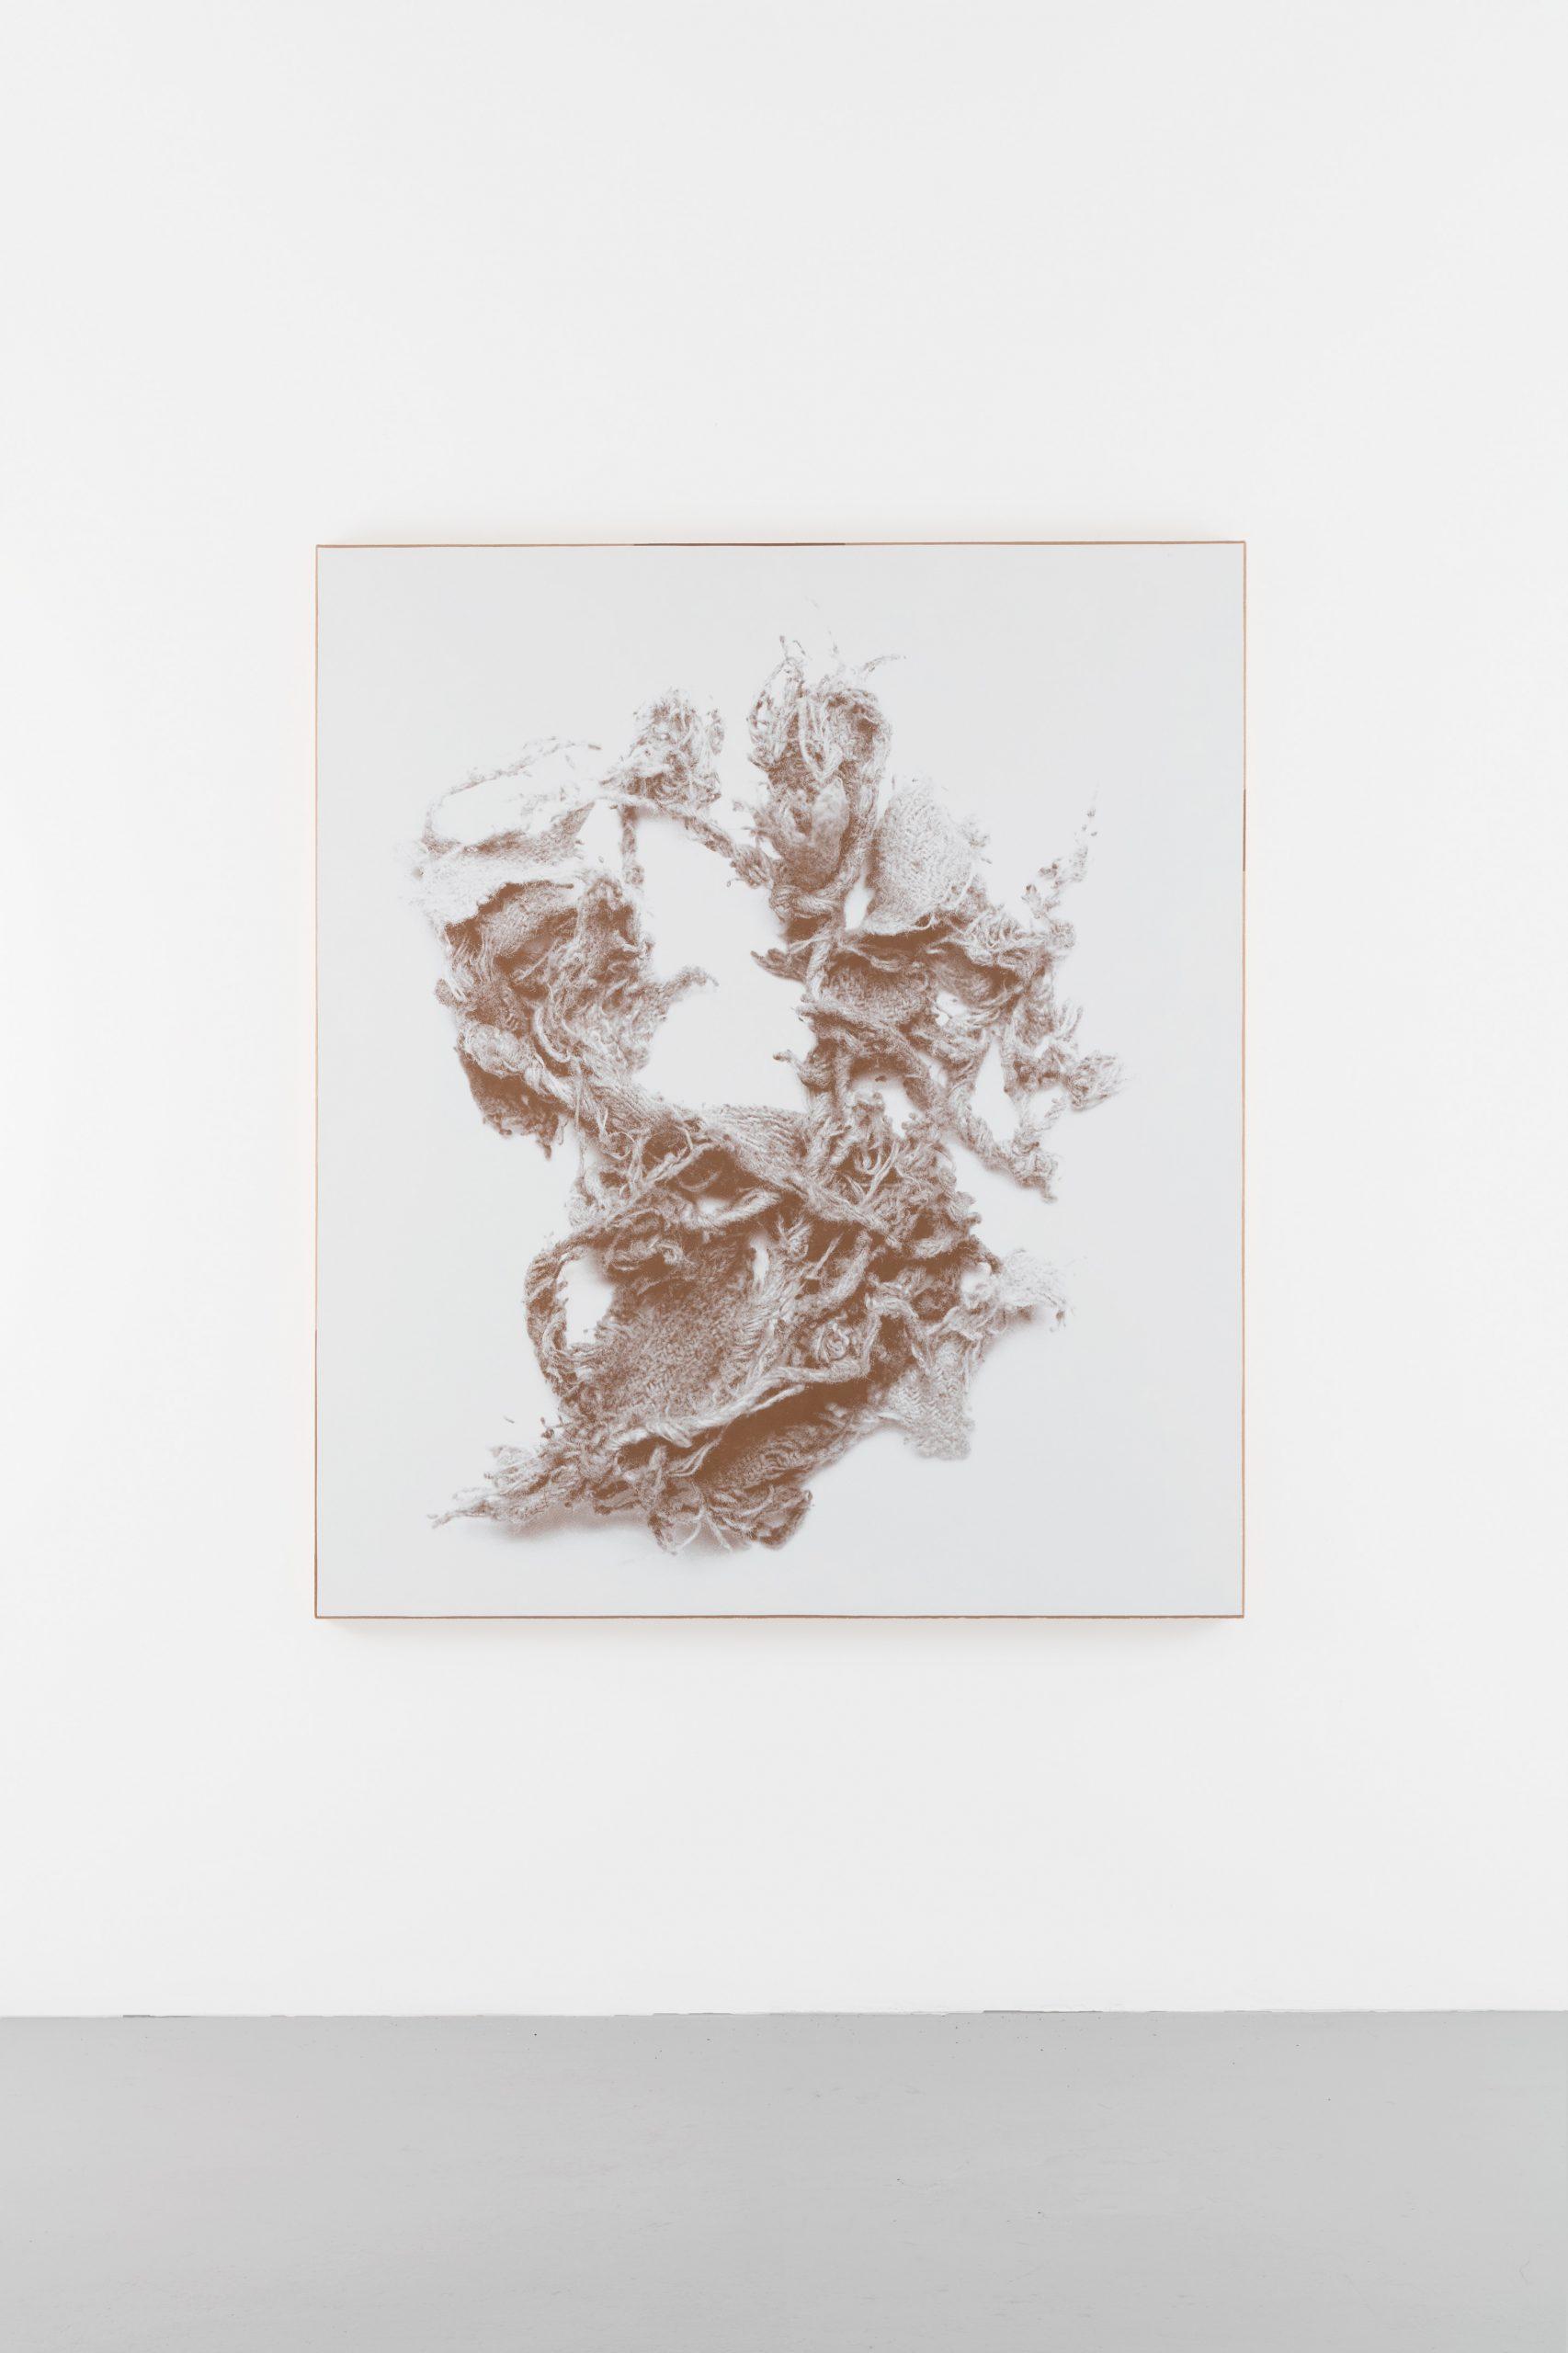 N. Dash Untitled, 2017; silkscreen ink, adobe, jute, wood support; photo Jean Vong; Courtesy the artist, Casey Kaplan Gallery, New York, and Mehdi Chouakri, Berlin